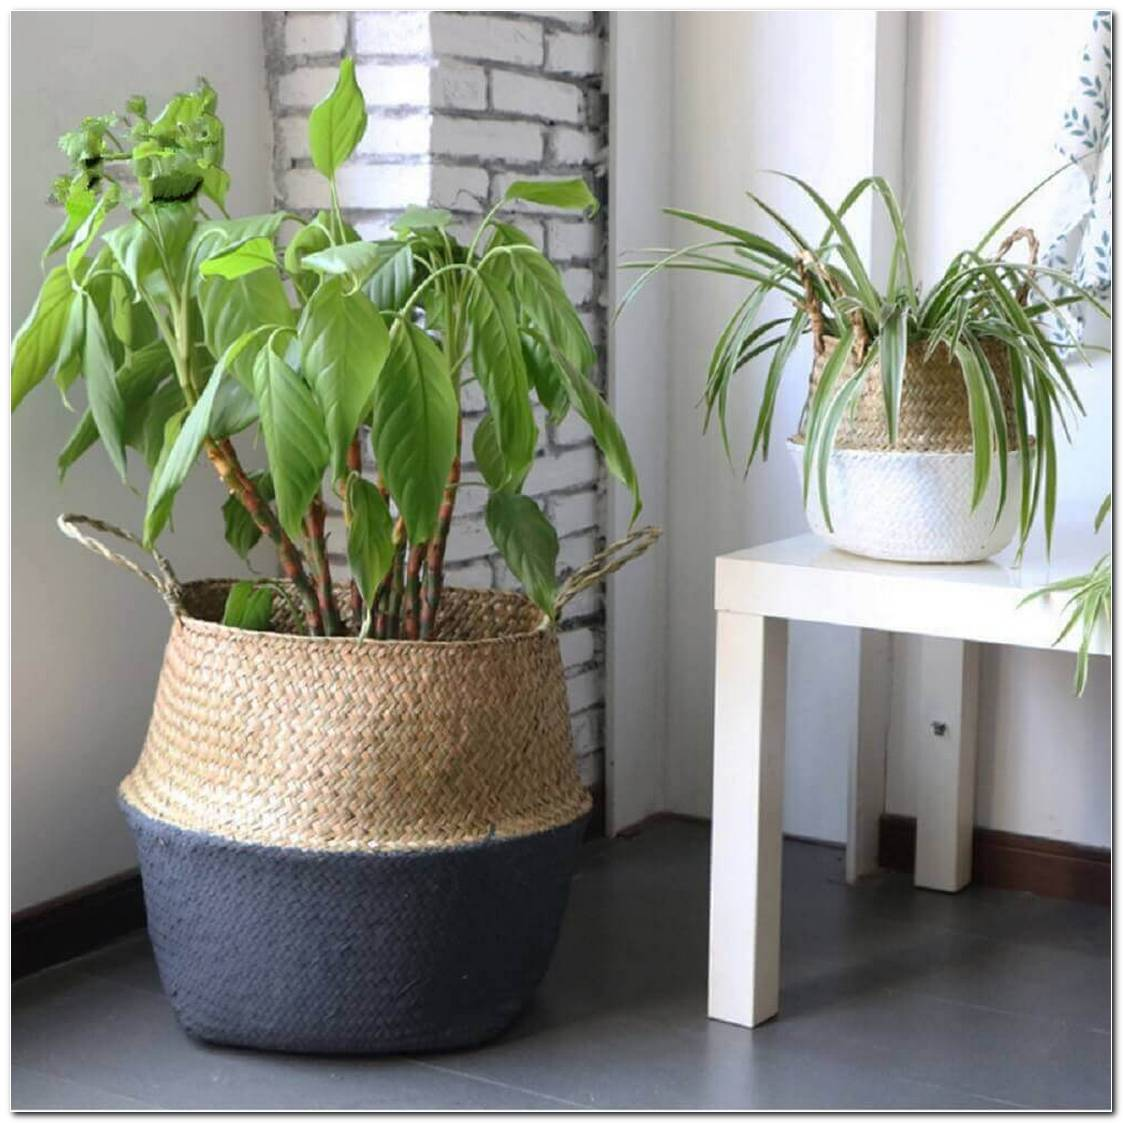 Vasos De Plantas Saiba Como Escolher O Tipo Ideal